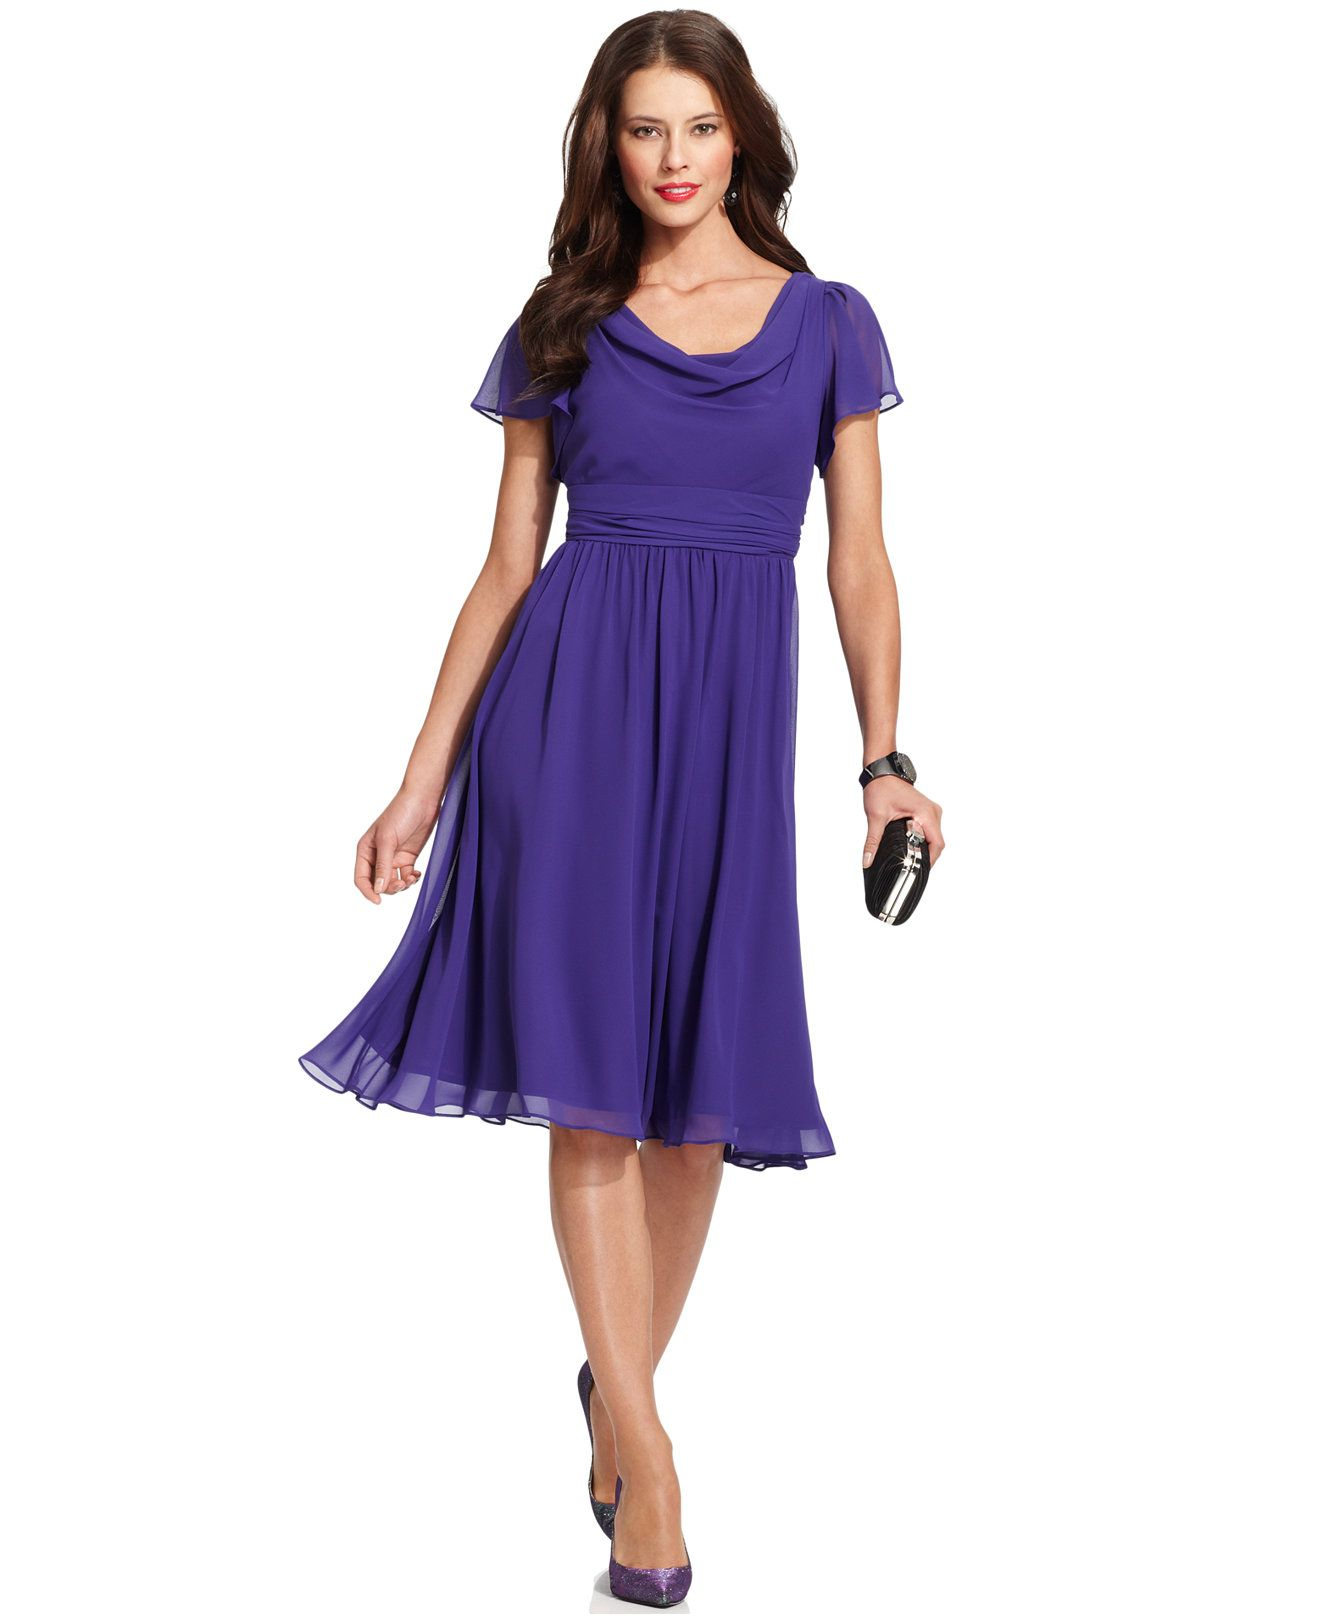 Sl sl fashion dresses - Sl Fashions Short Sleeve Cowl Neck Dress Dresses Women Macy S